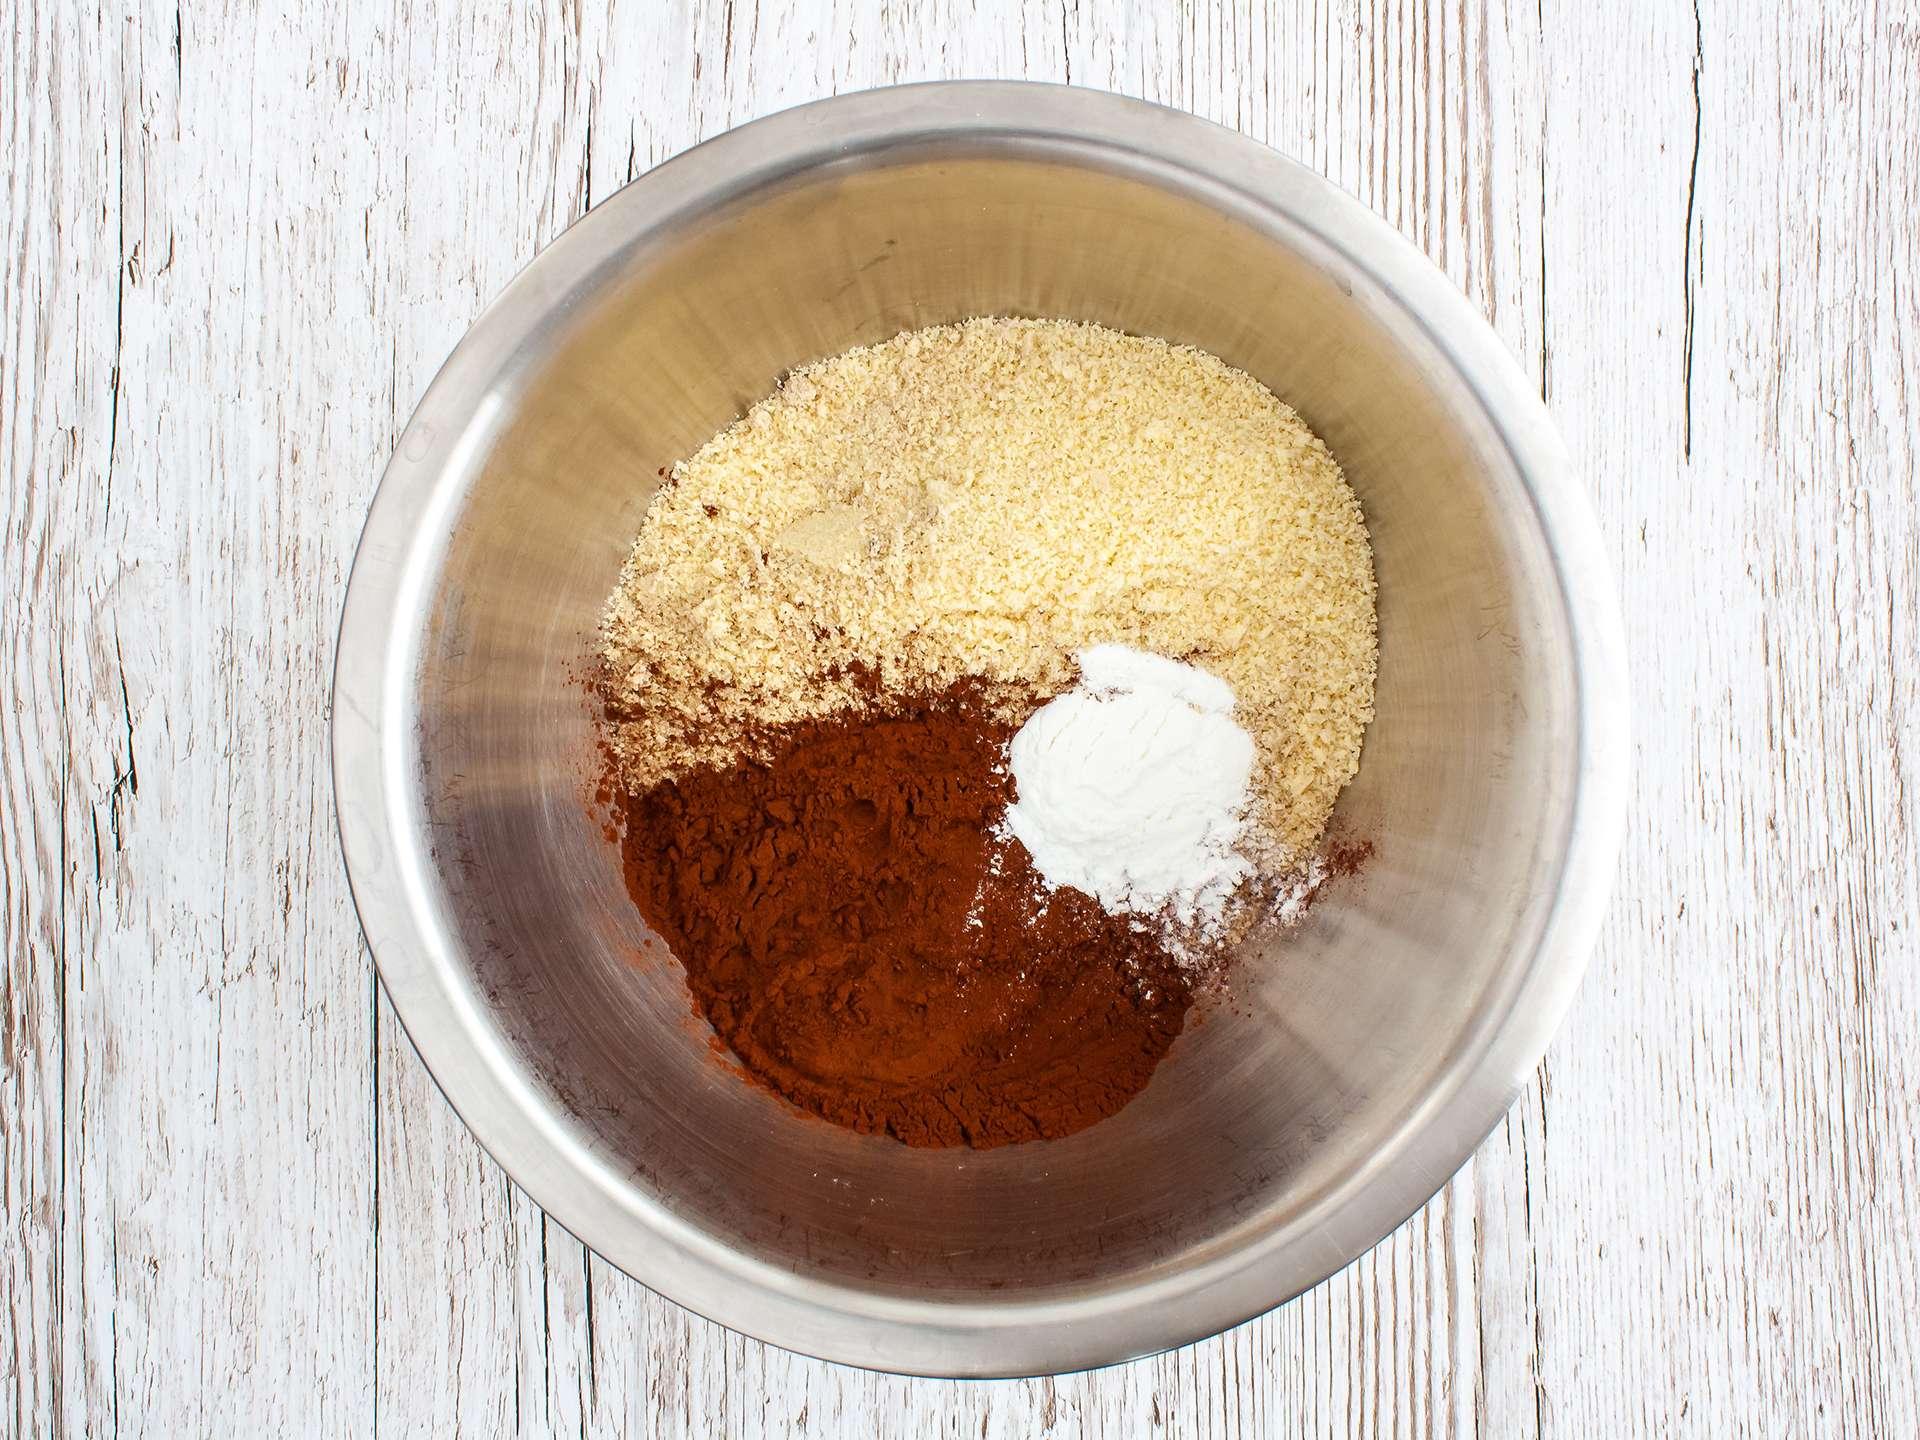 Step 2.1 of Gluten Free Vegan Chocolate Cupcakes with Apricot Jam Recipe